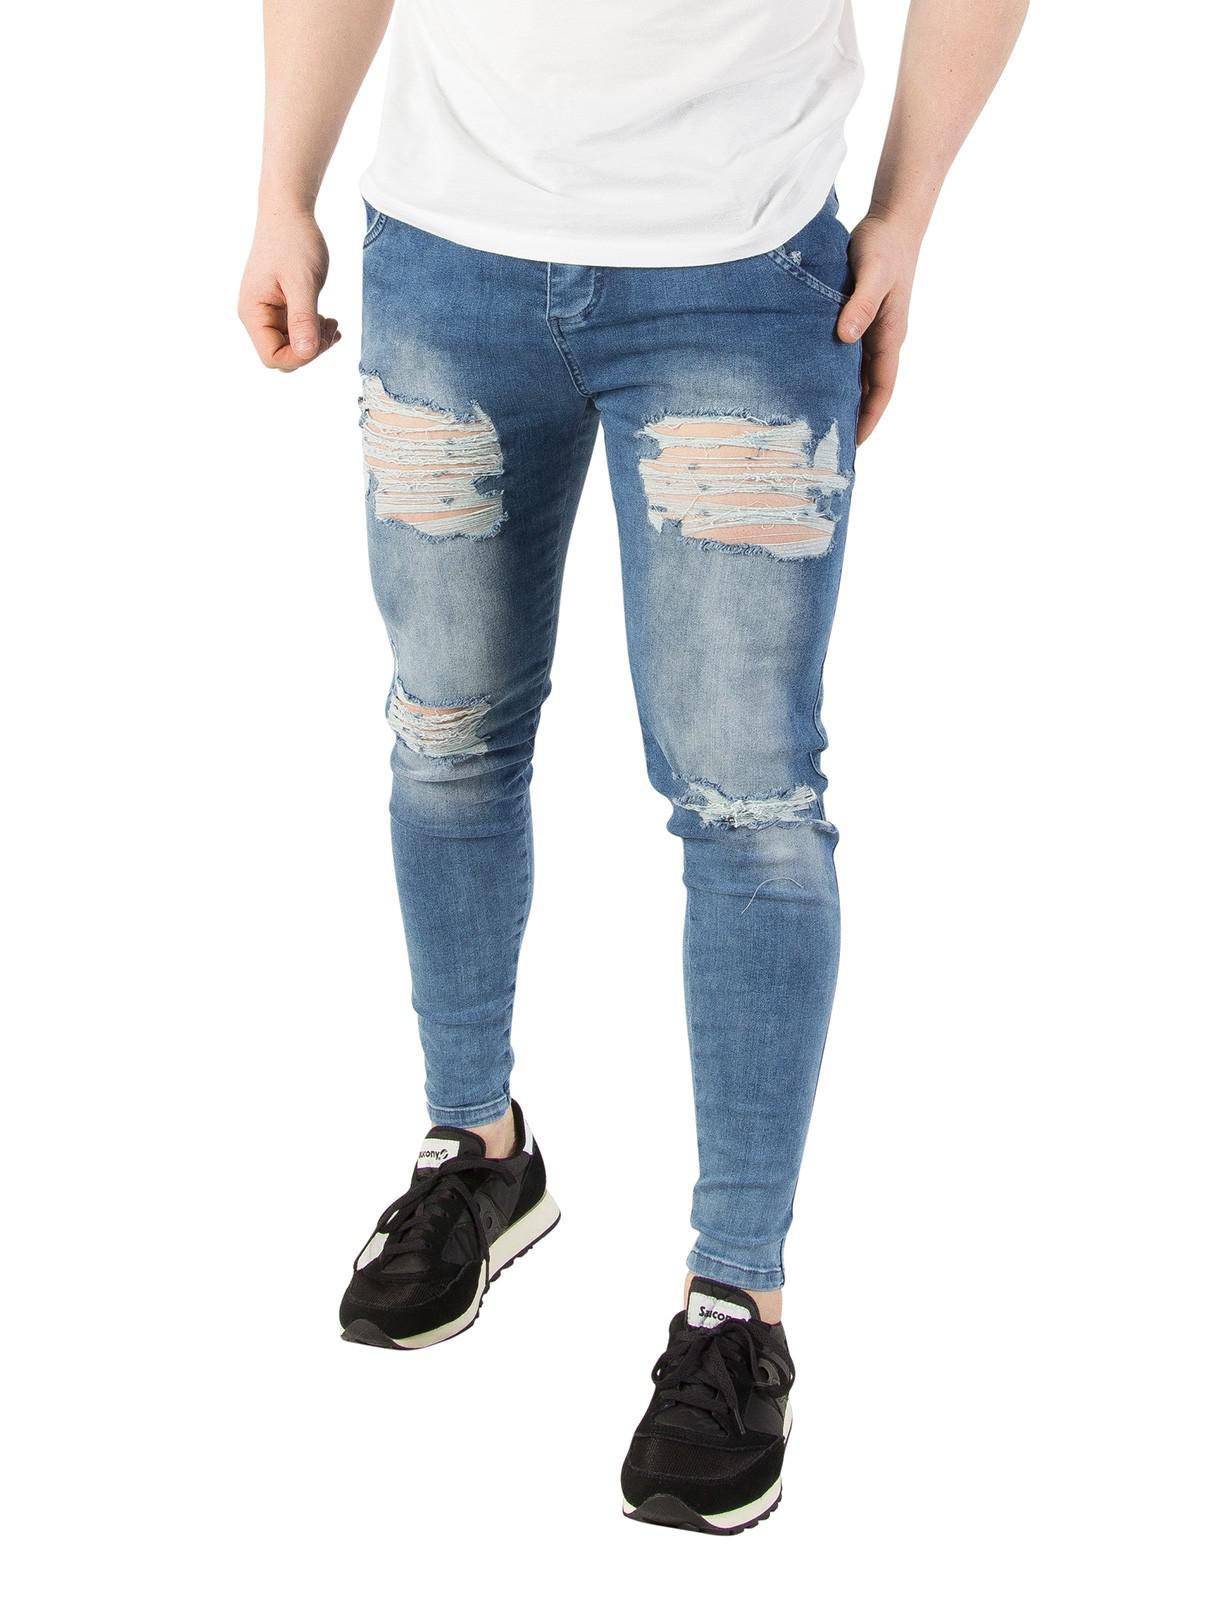 Super Skinny Fit Jeans In Acid Blue With Distressing - Blue Siksilk nxRuz